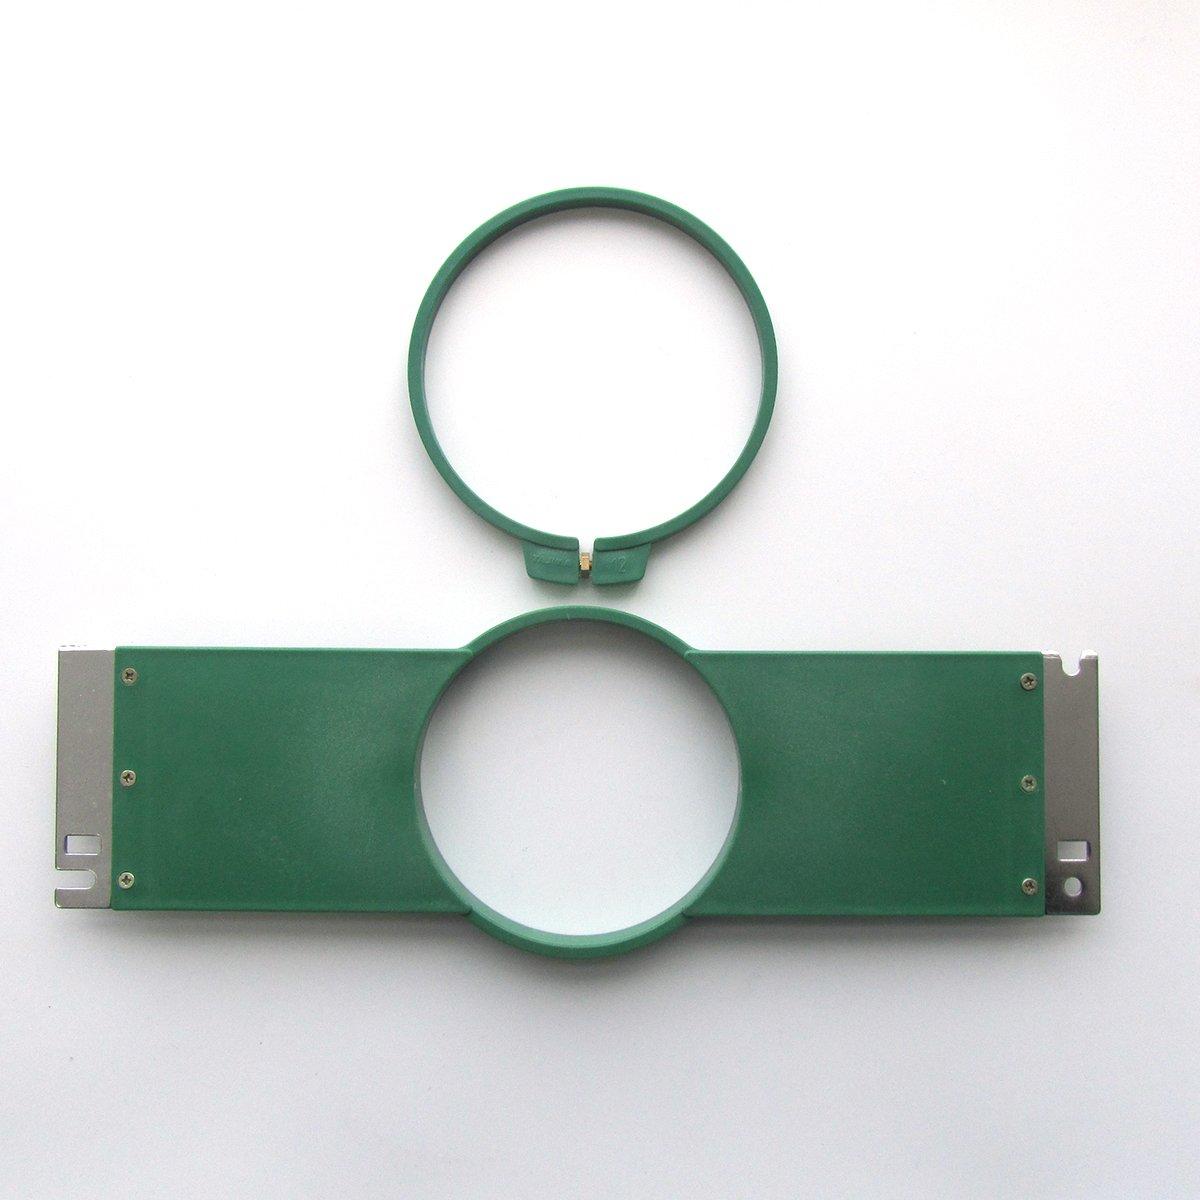 KUNPENG - 1 piezas Aro de bordado de 12 cm 4.7